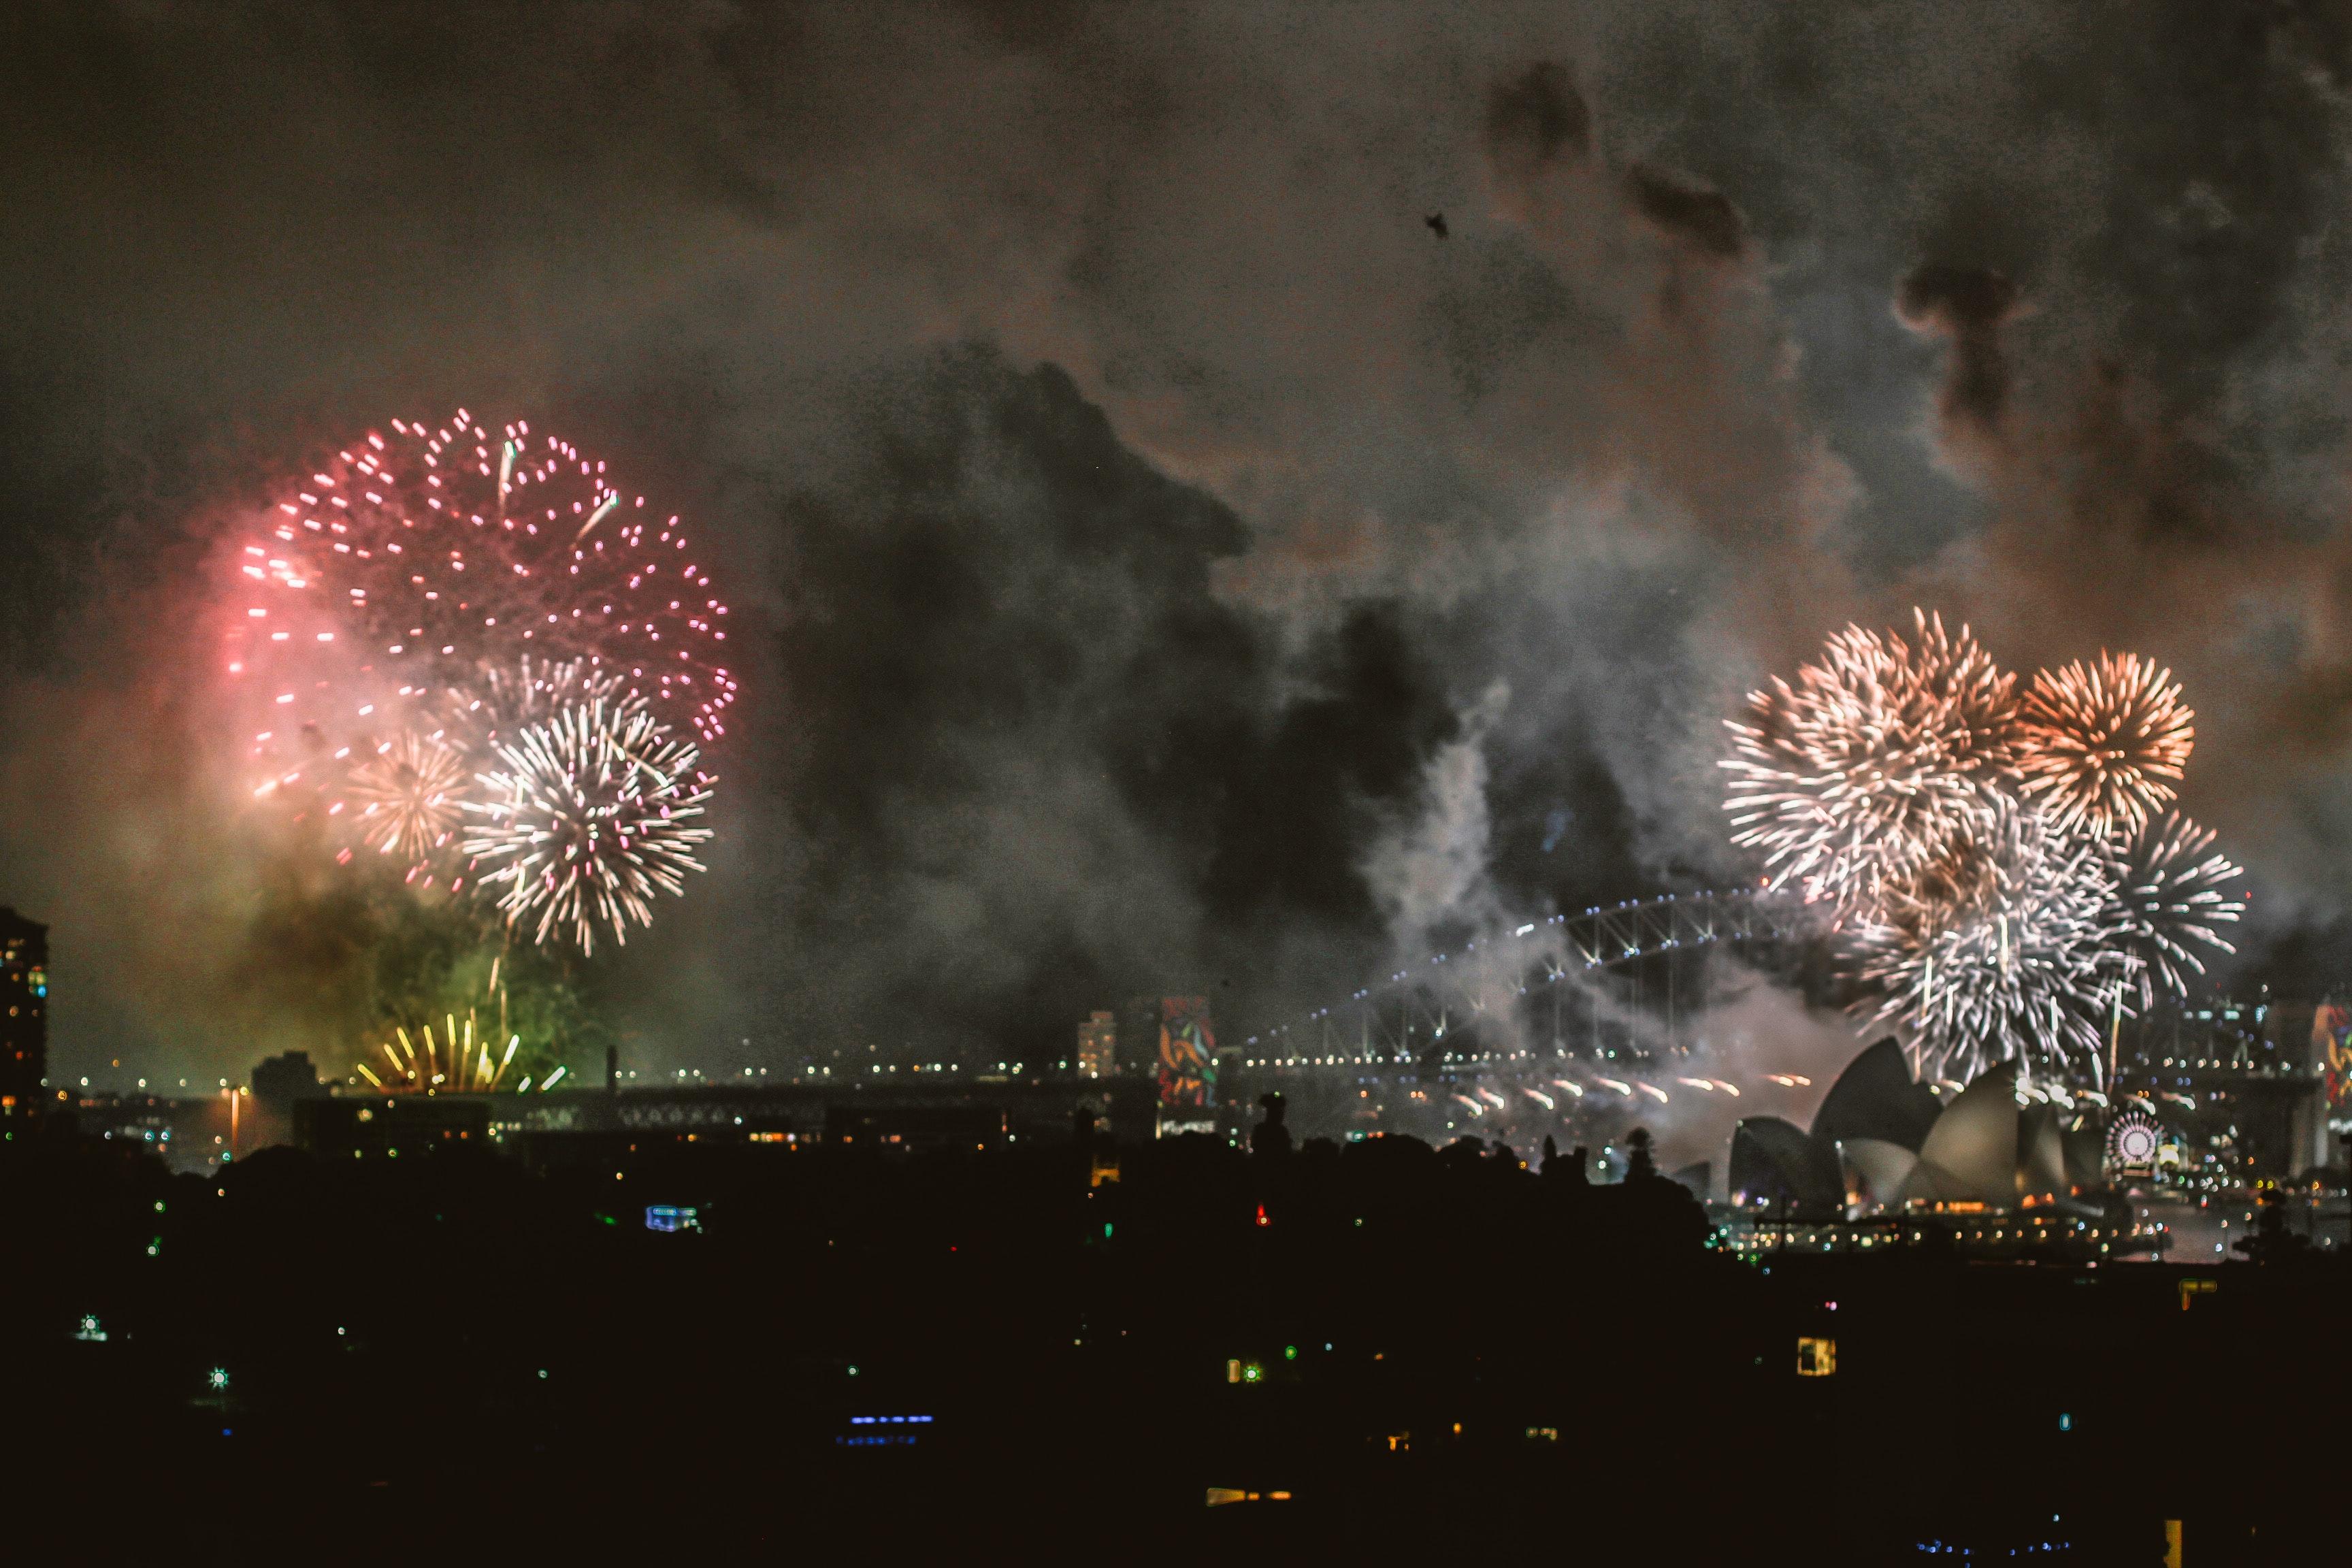 Fireworks Display at Sydney Opera House, Independence Day, Sydney, Sparks, Smoke, HQ Photo